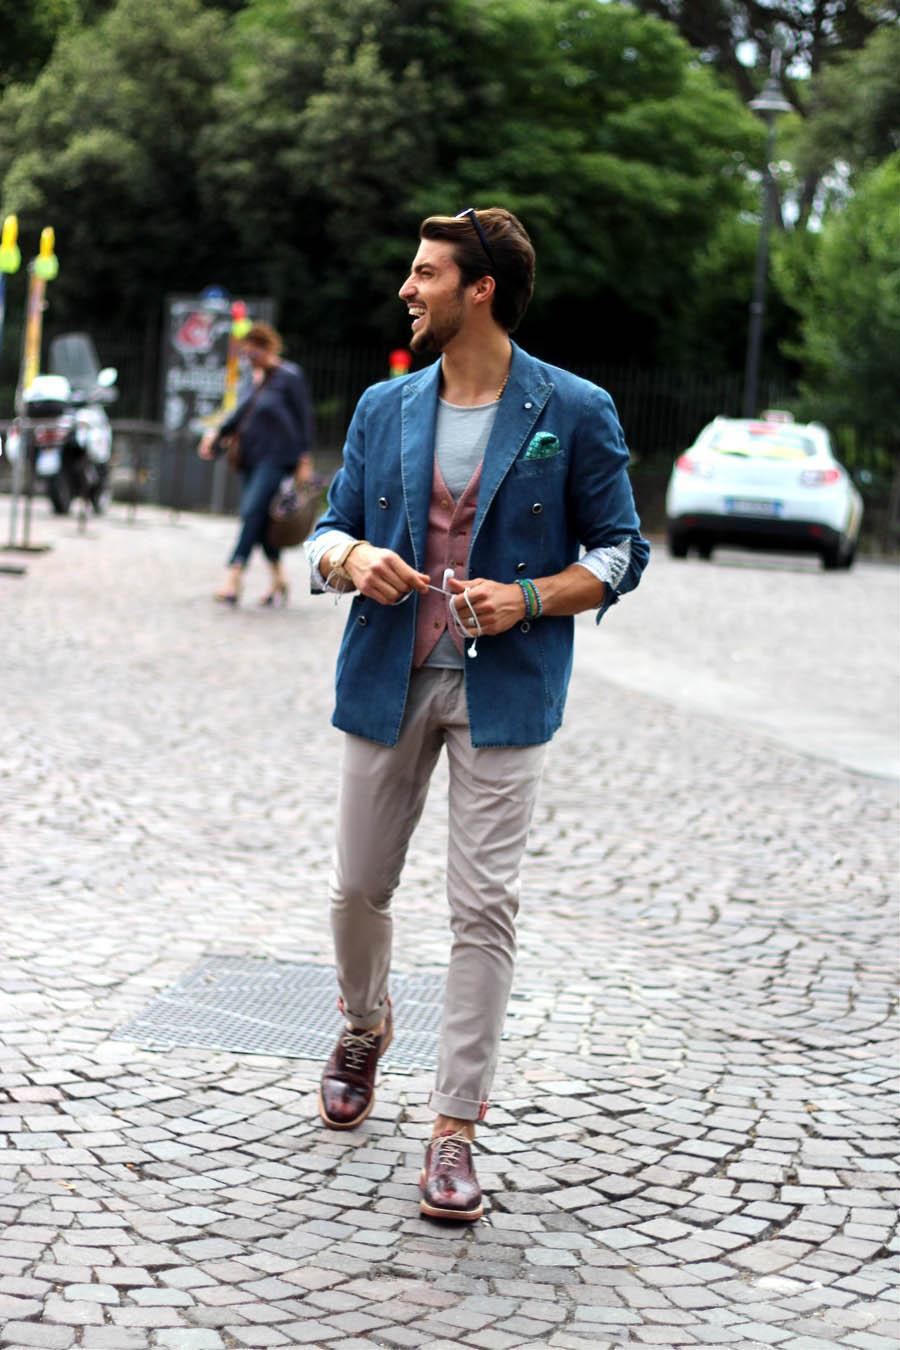 Menswear Streetstyle at Pitti Uomo